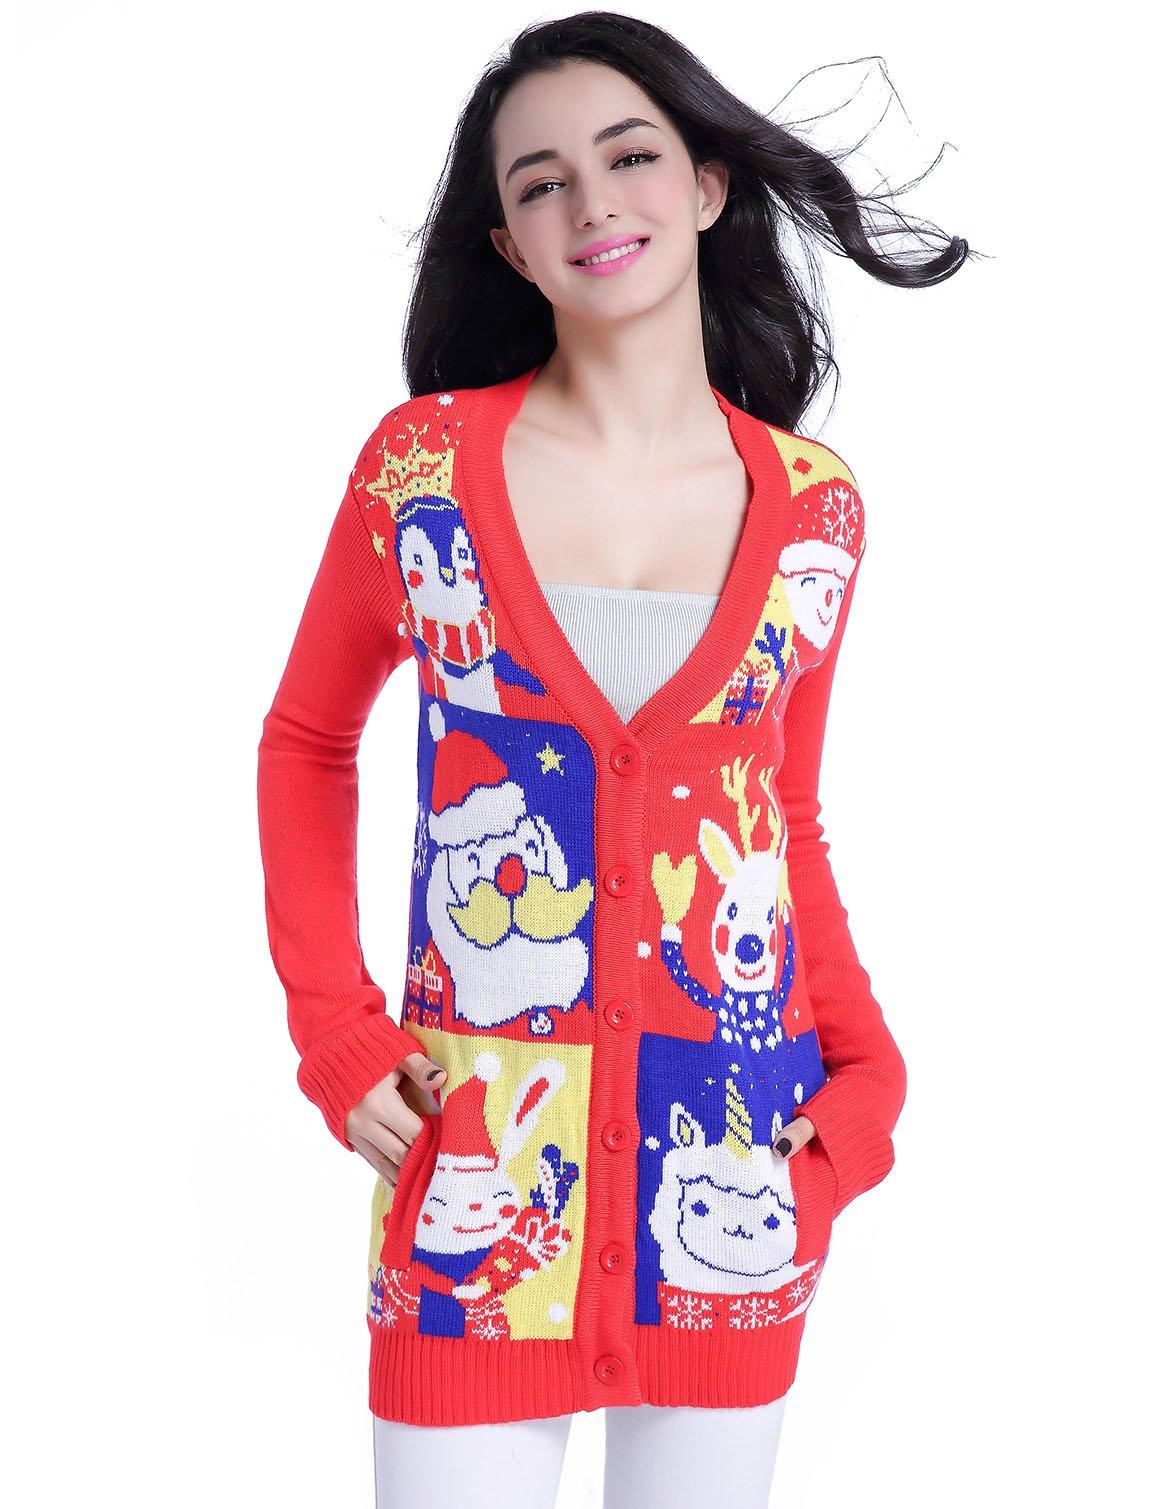 3x Ugly Christmas Sweater.V28 Ugly Christmas Sweater Women Girls Ladies Happy Fun Knit Sweater Cardigan 3x Large Happy Cardigan Black